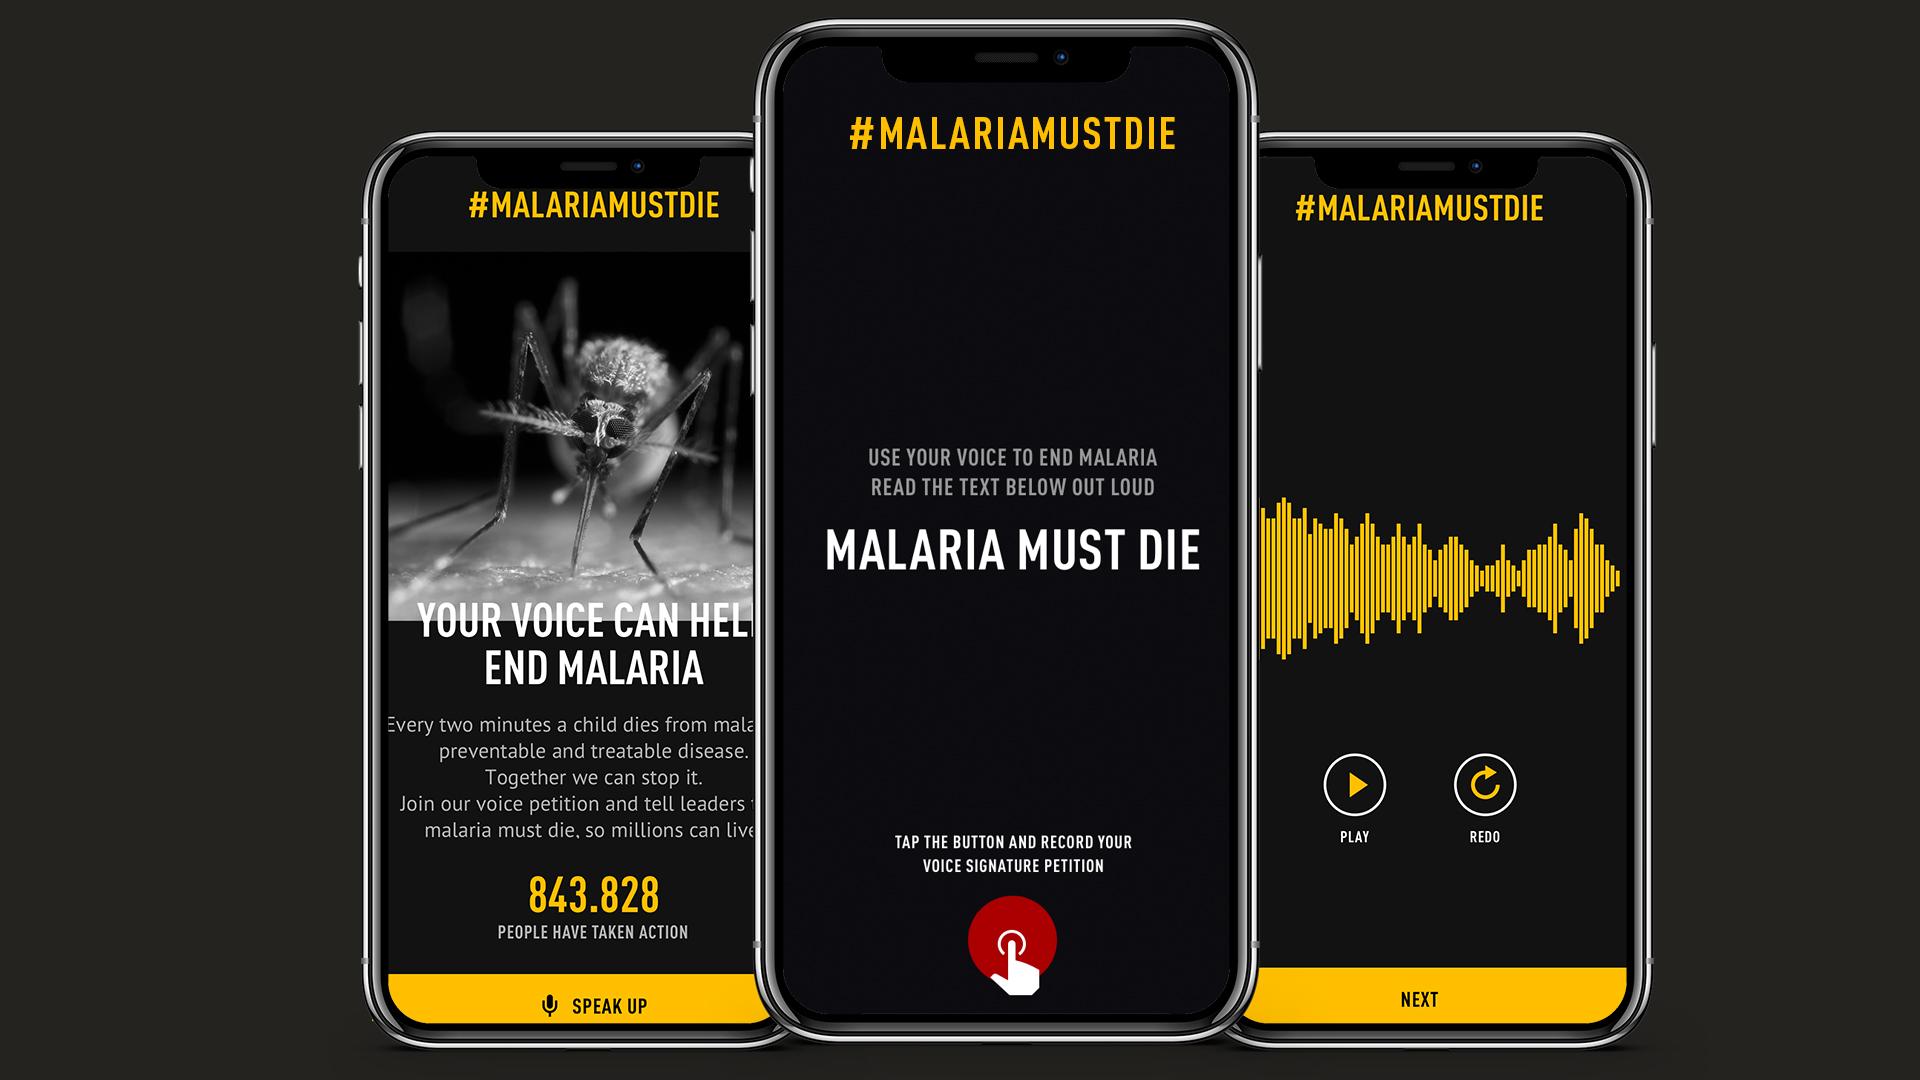 MalariaMustDie_02.jpg